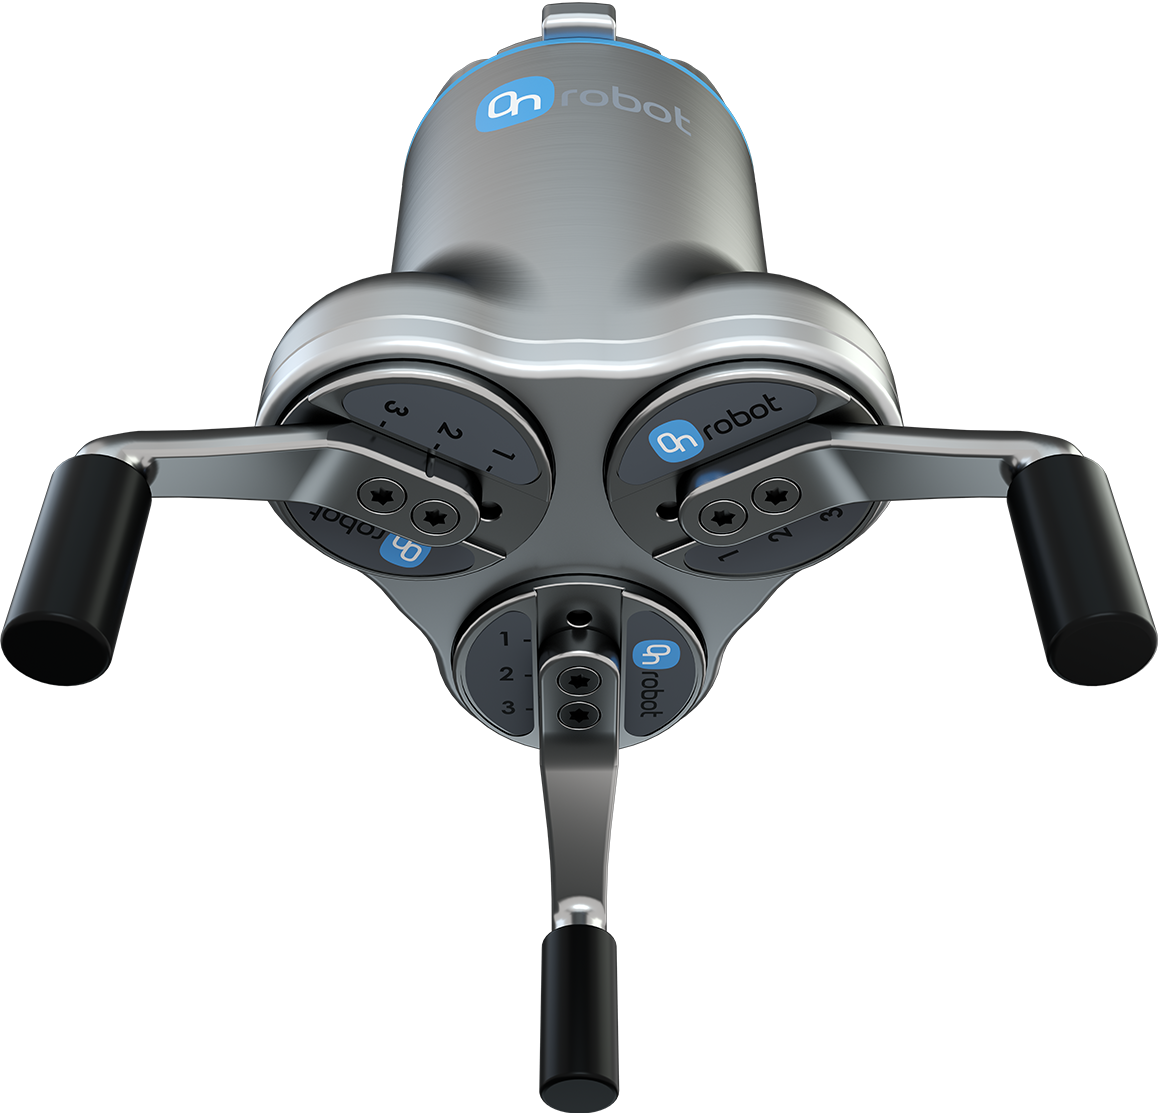 3FG15 OnRobot